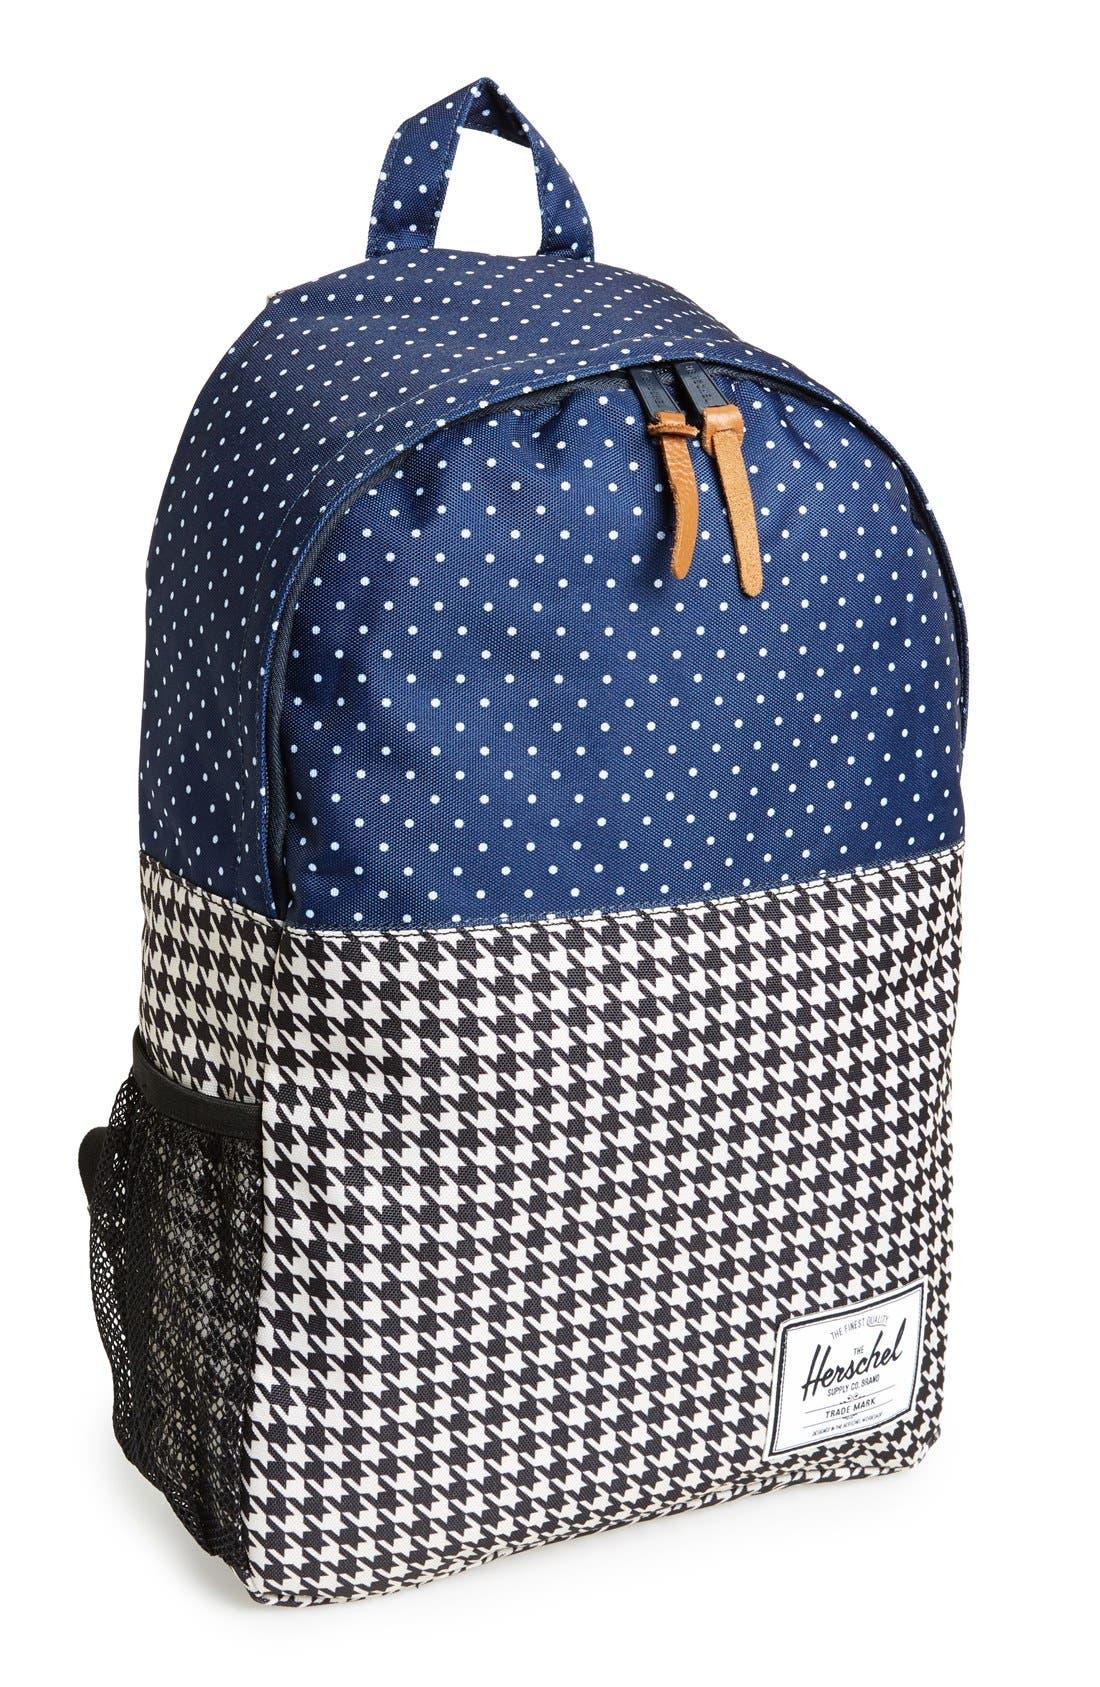 Alternate Image 1 Selected - Herschel Supply Co. 'Jasper' Backpack